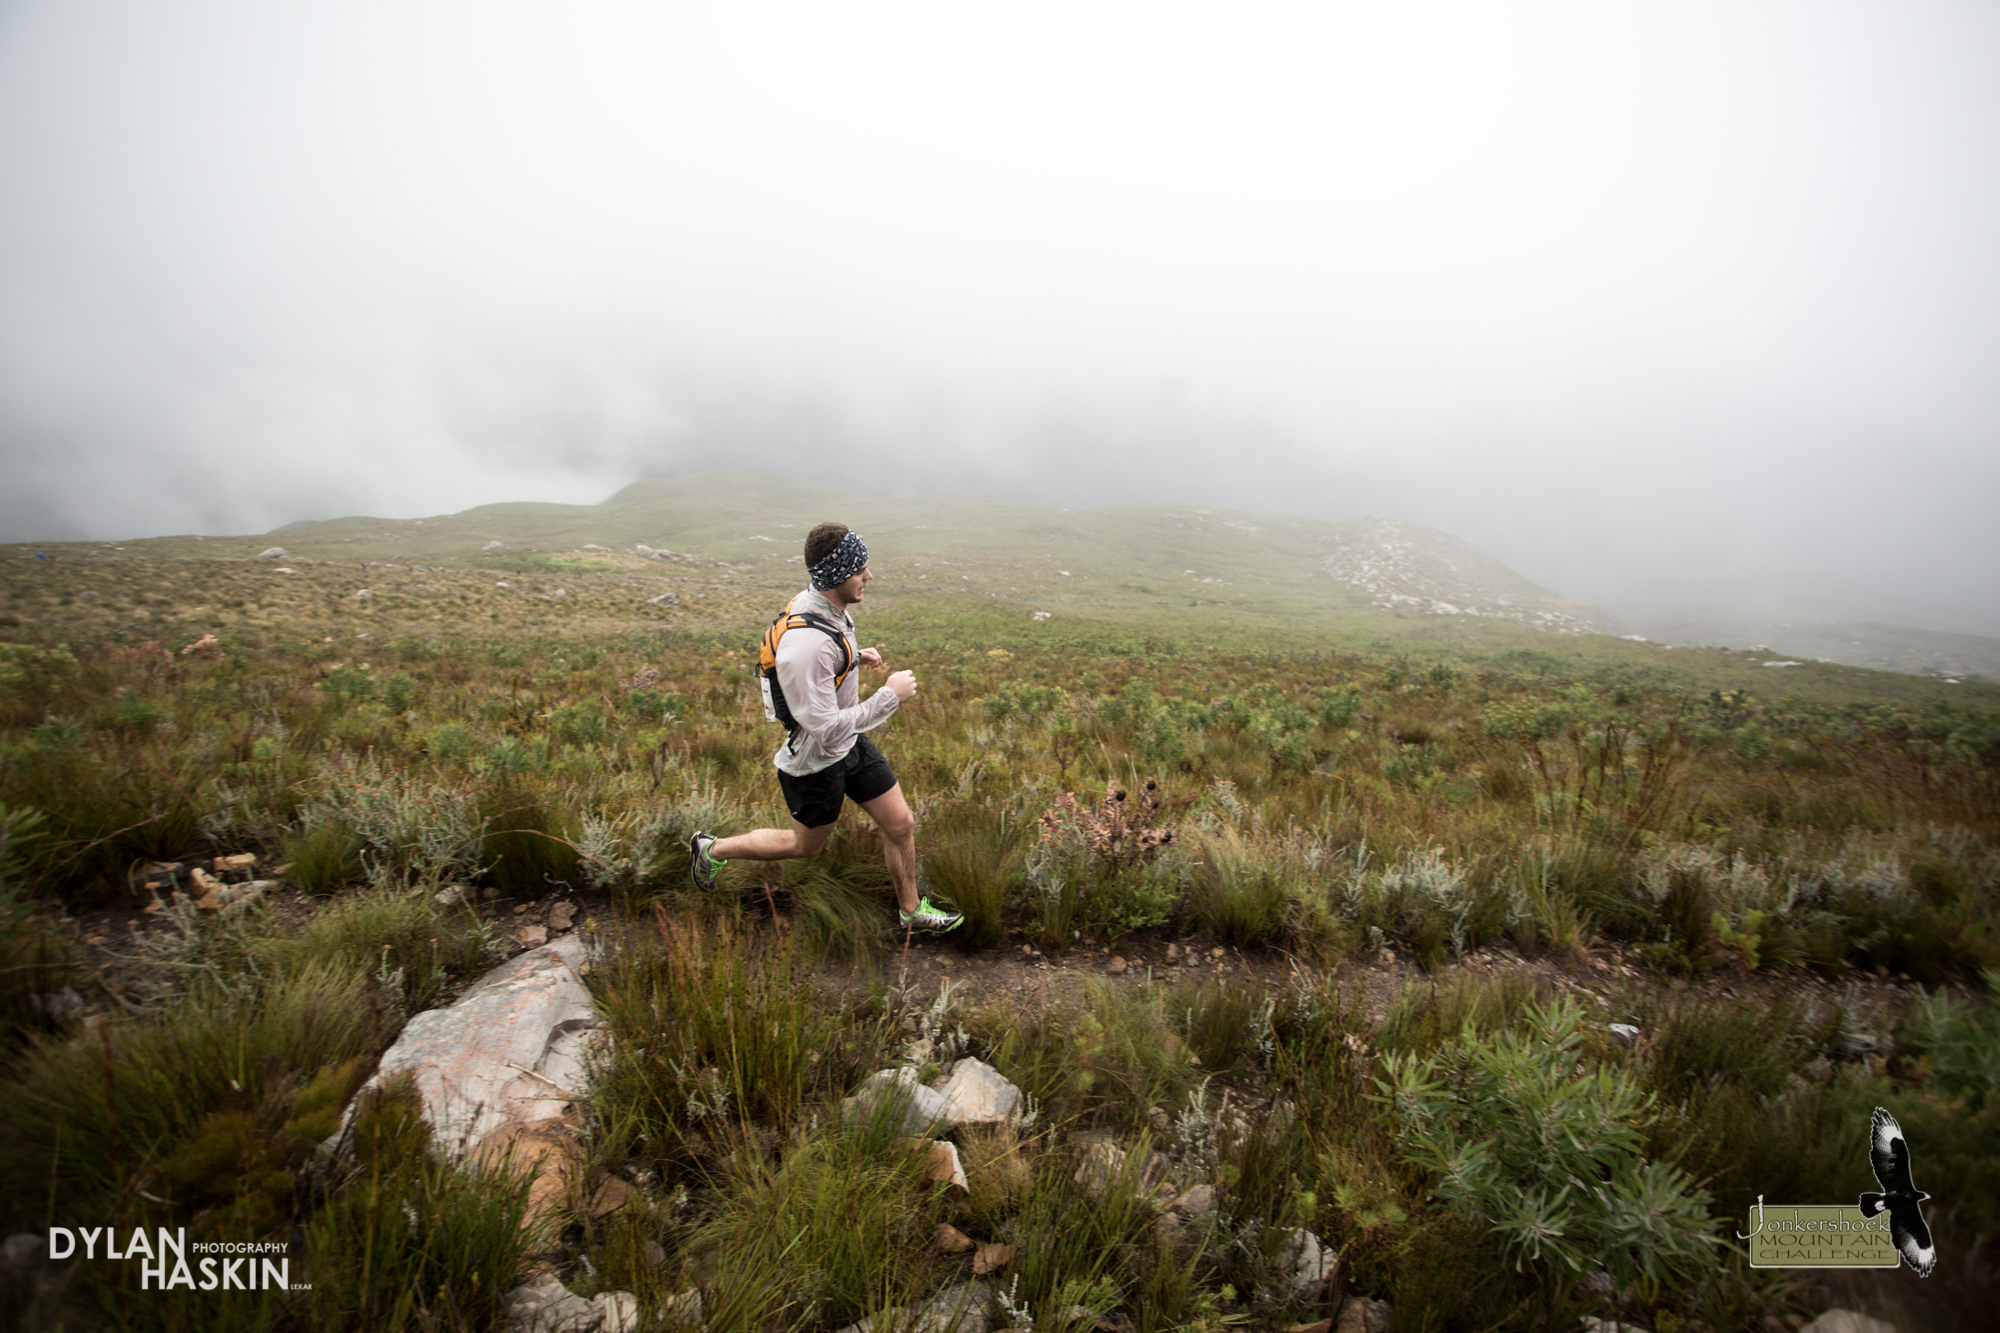 Running in Jonkershoek Nature Reserve is nothing short of spectacular